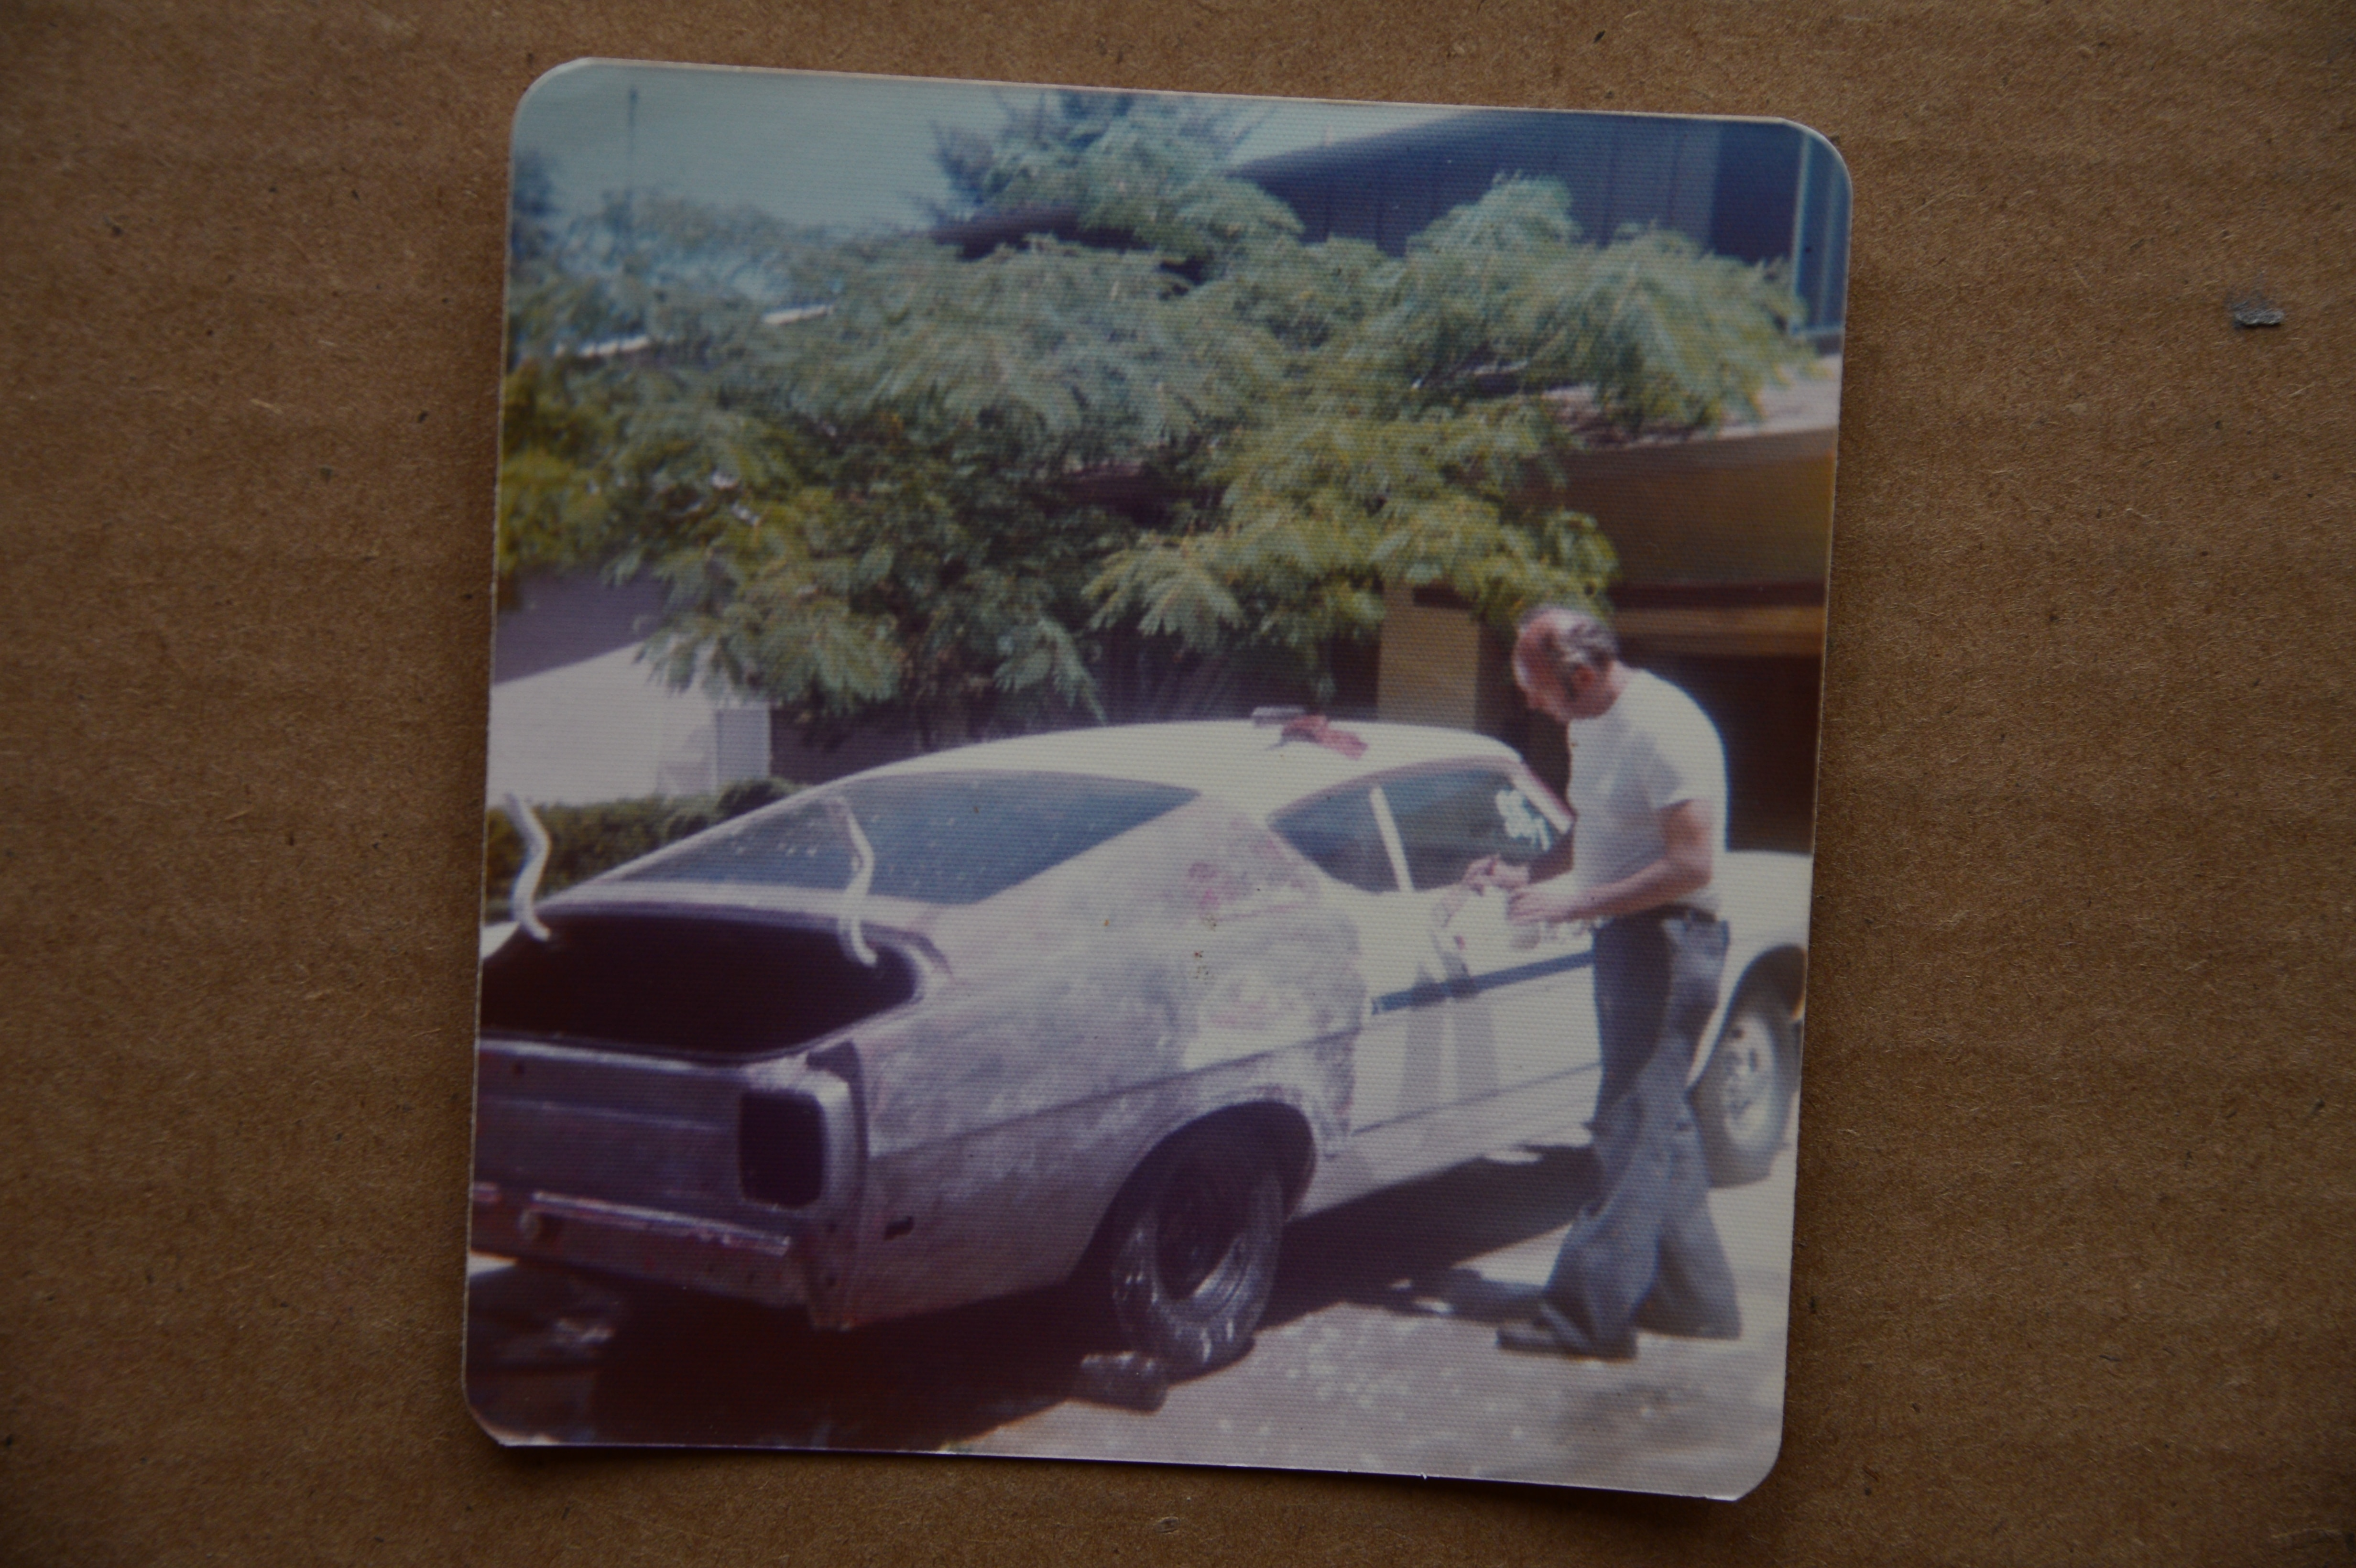 002 Rare Find 1969 Ford Fairlane Cobra Drag Team Driveway